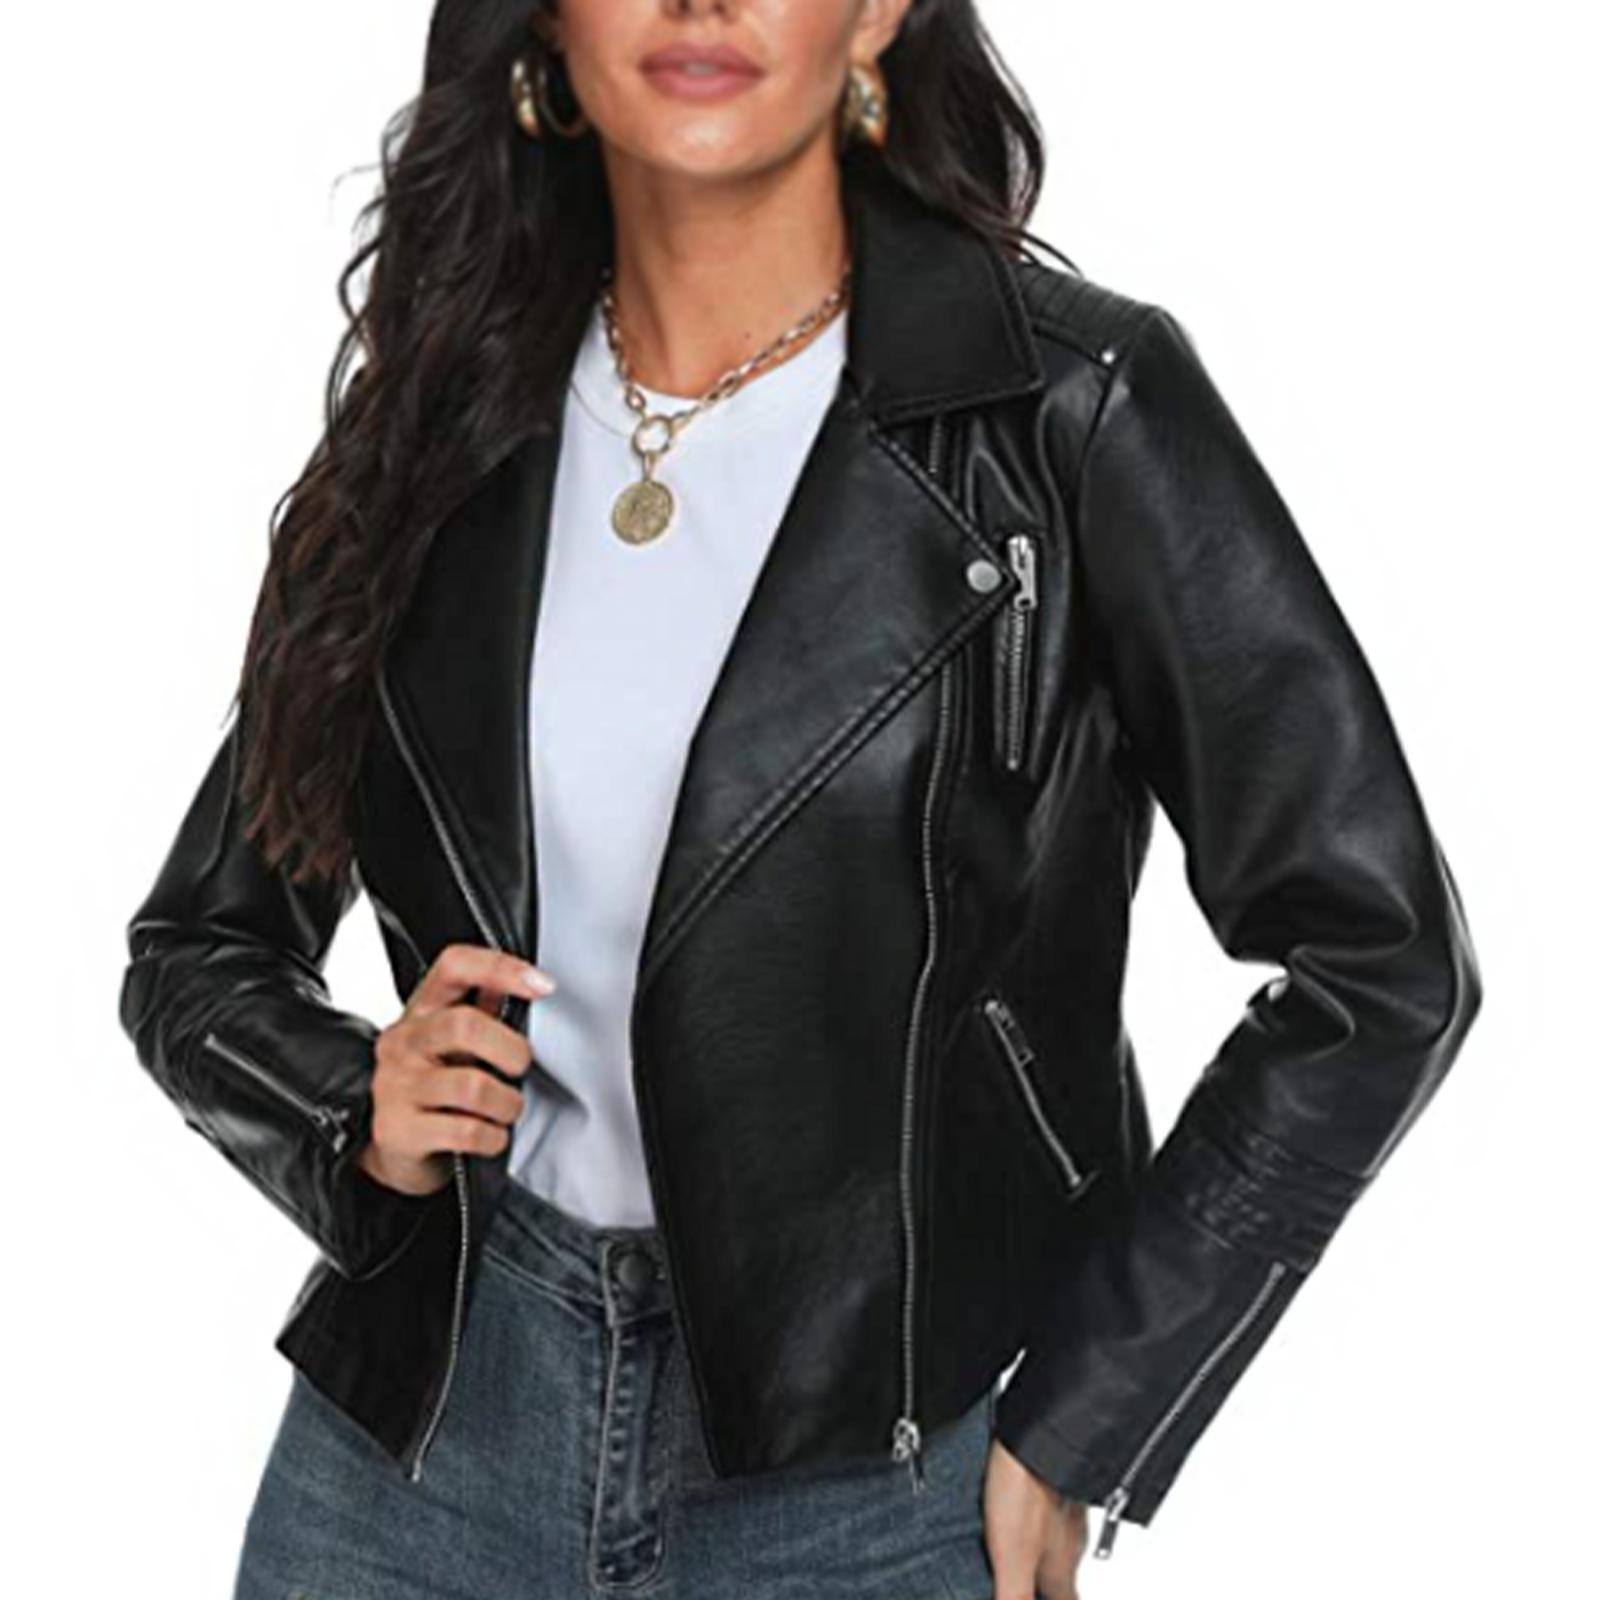 New Women's Motorcycle Moto Biker Vegan Real Leather Fashionable Classic Jacket